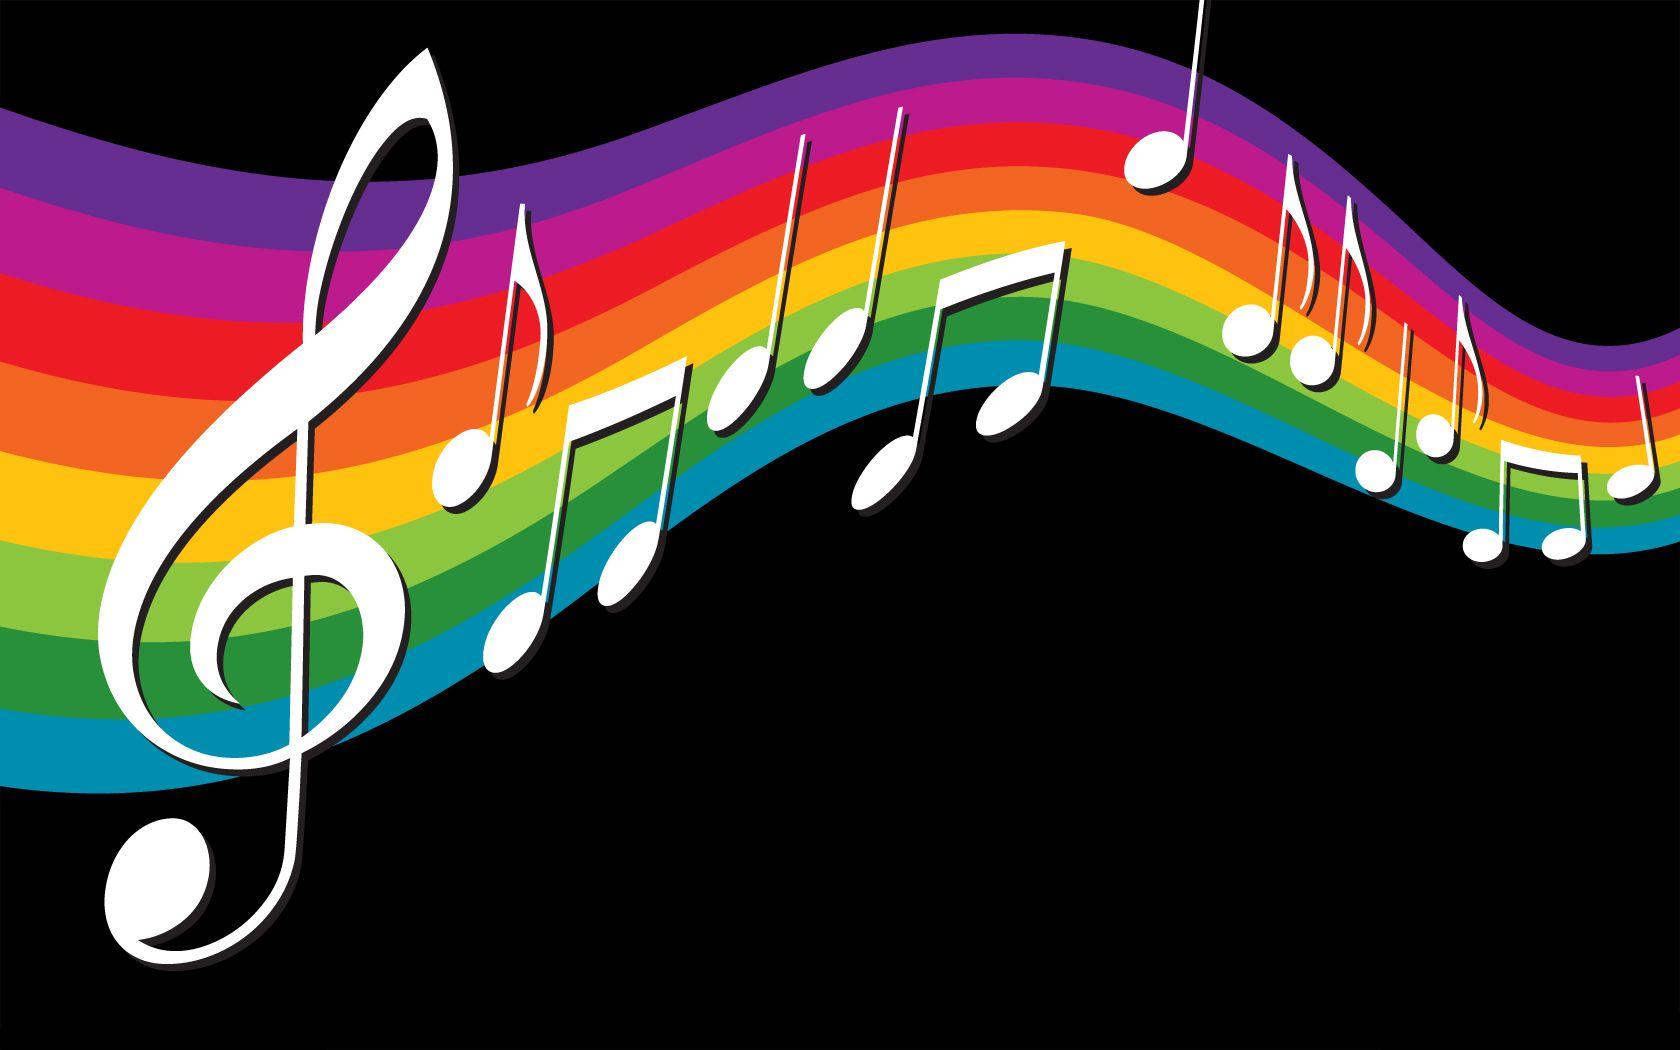 8589130490590 Rainbow Music Notes Wallpaper Hd Jpg